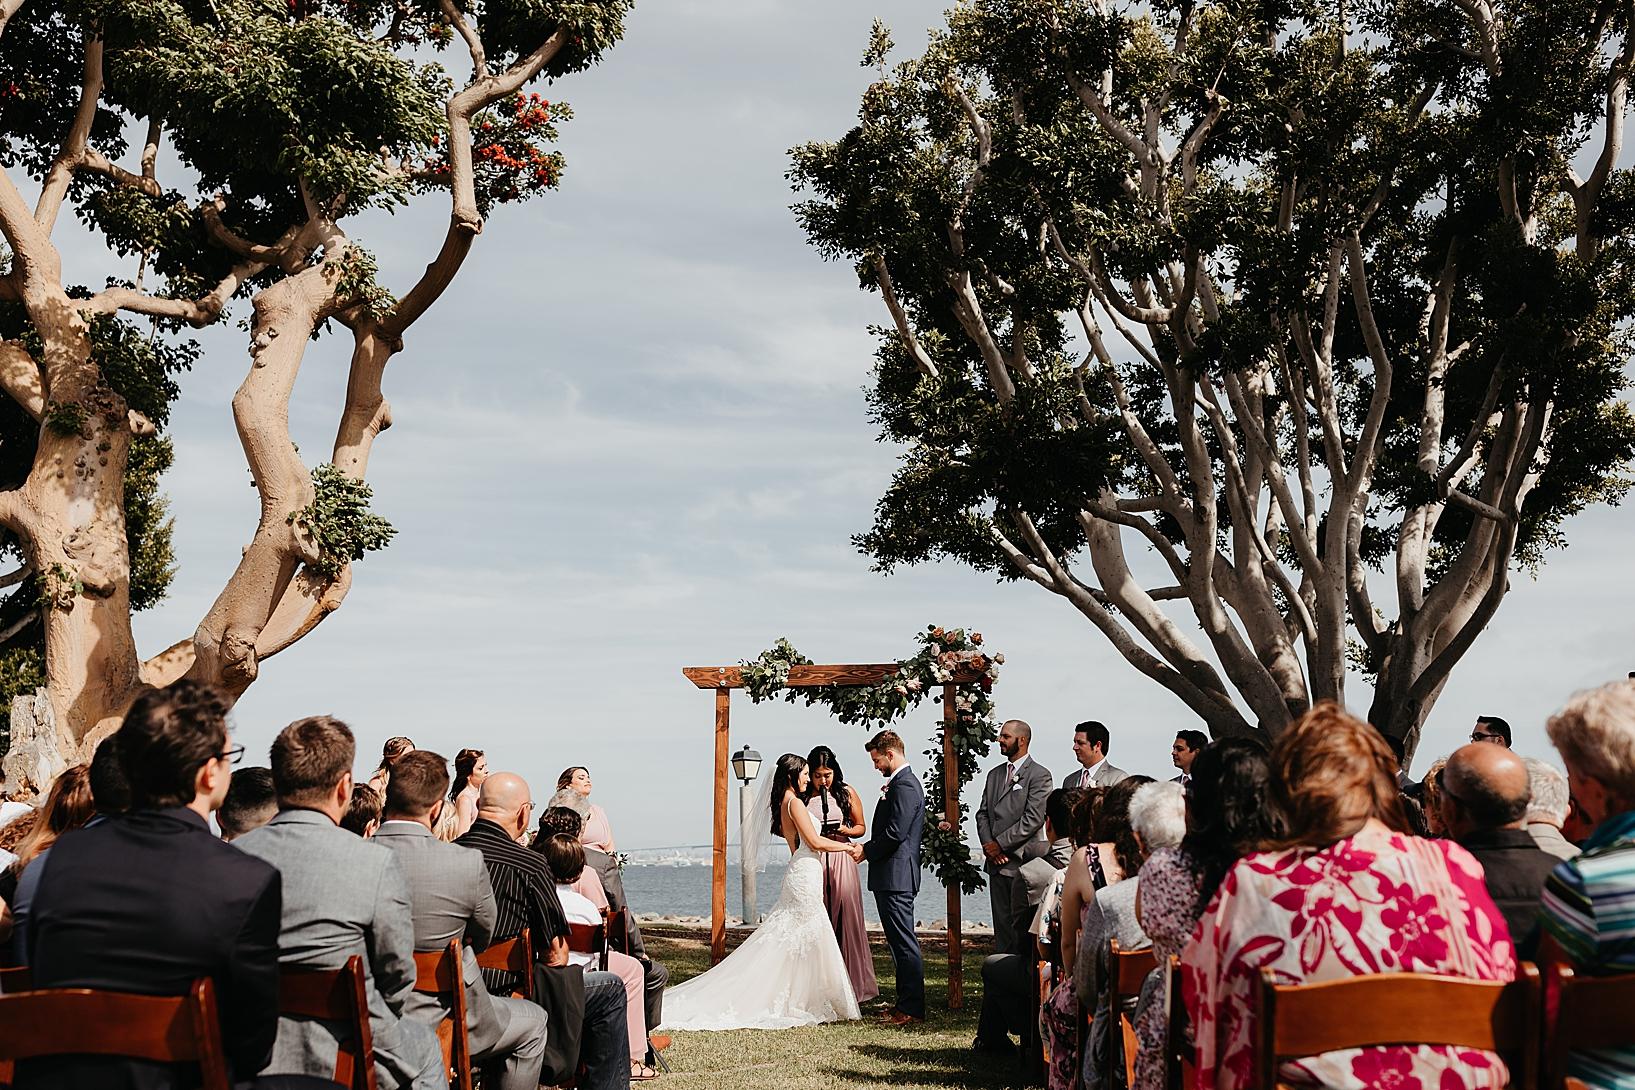 Harbor-Island-Brick-Wedding-45.jpg